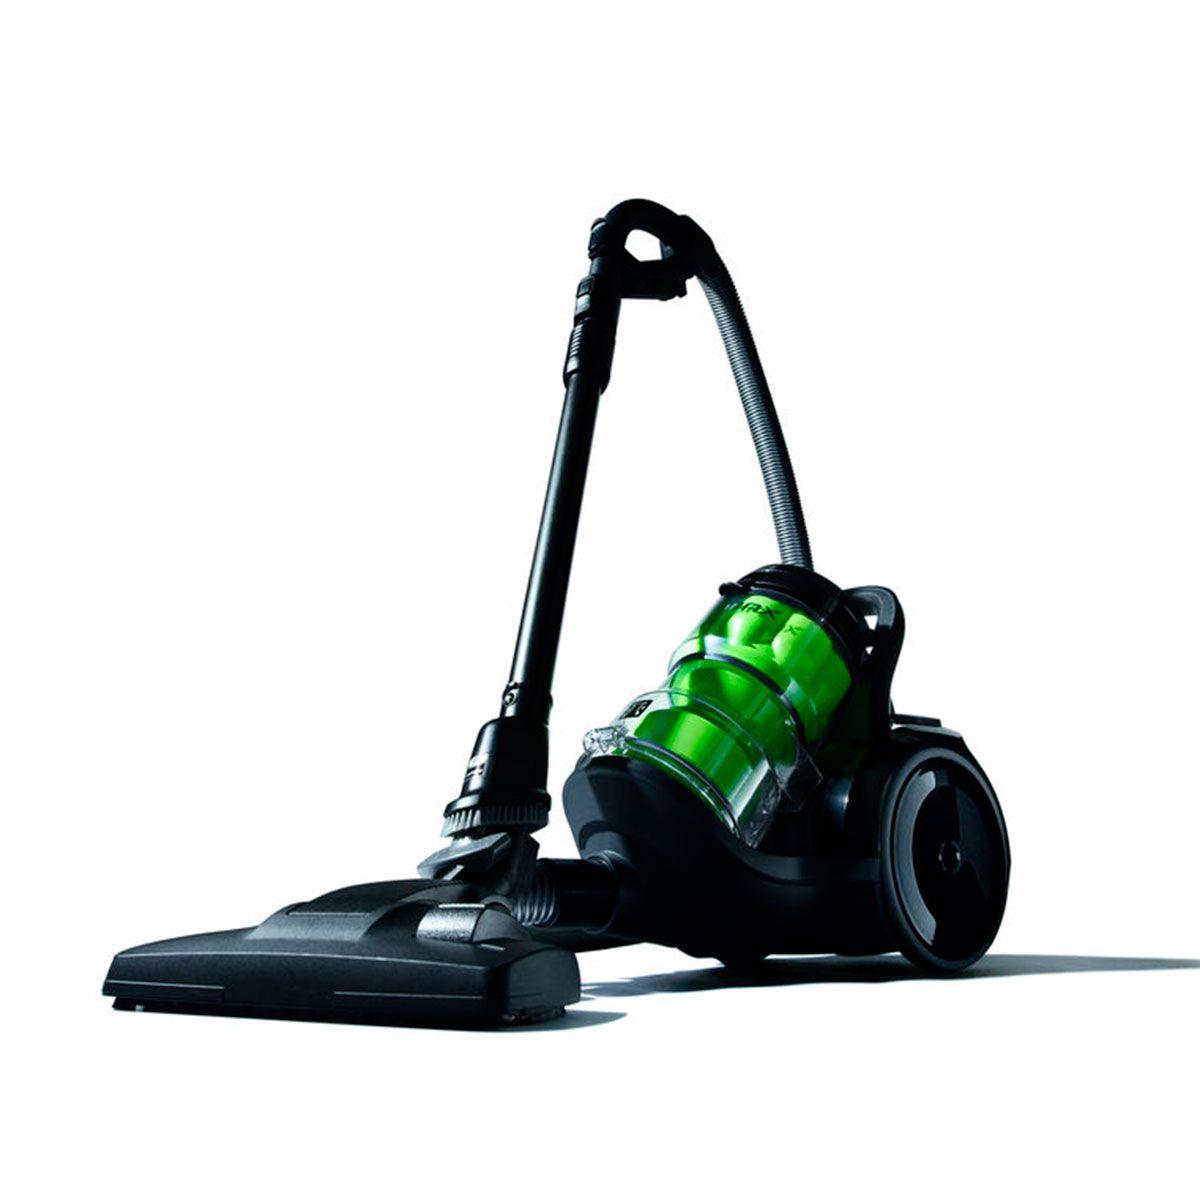 Panasonic MC UL712KP47 Vacuum Cleaner